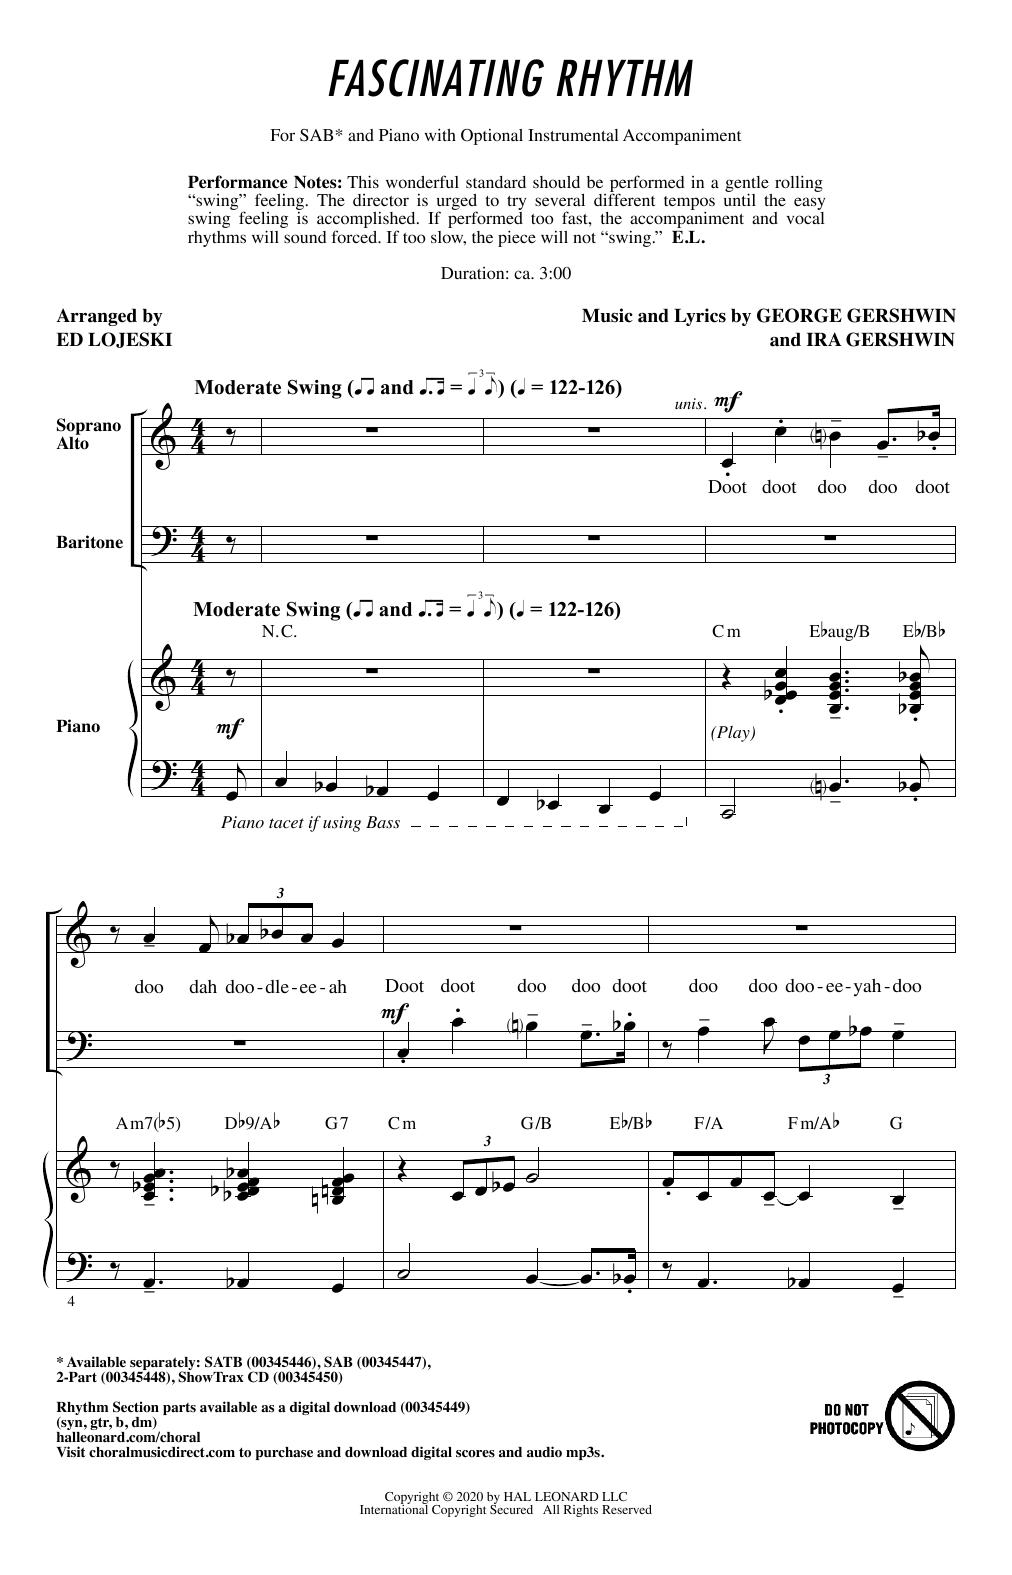 Fascinating Rhythm (from Lady Be Good) (arr. Ed Lojeski) Sheet Music